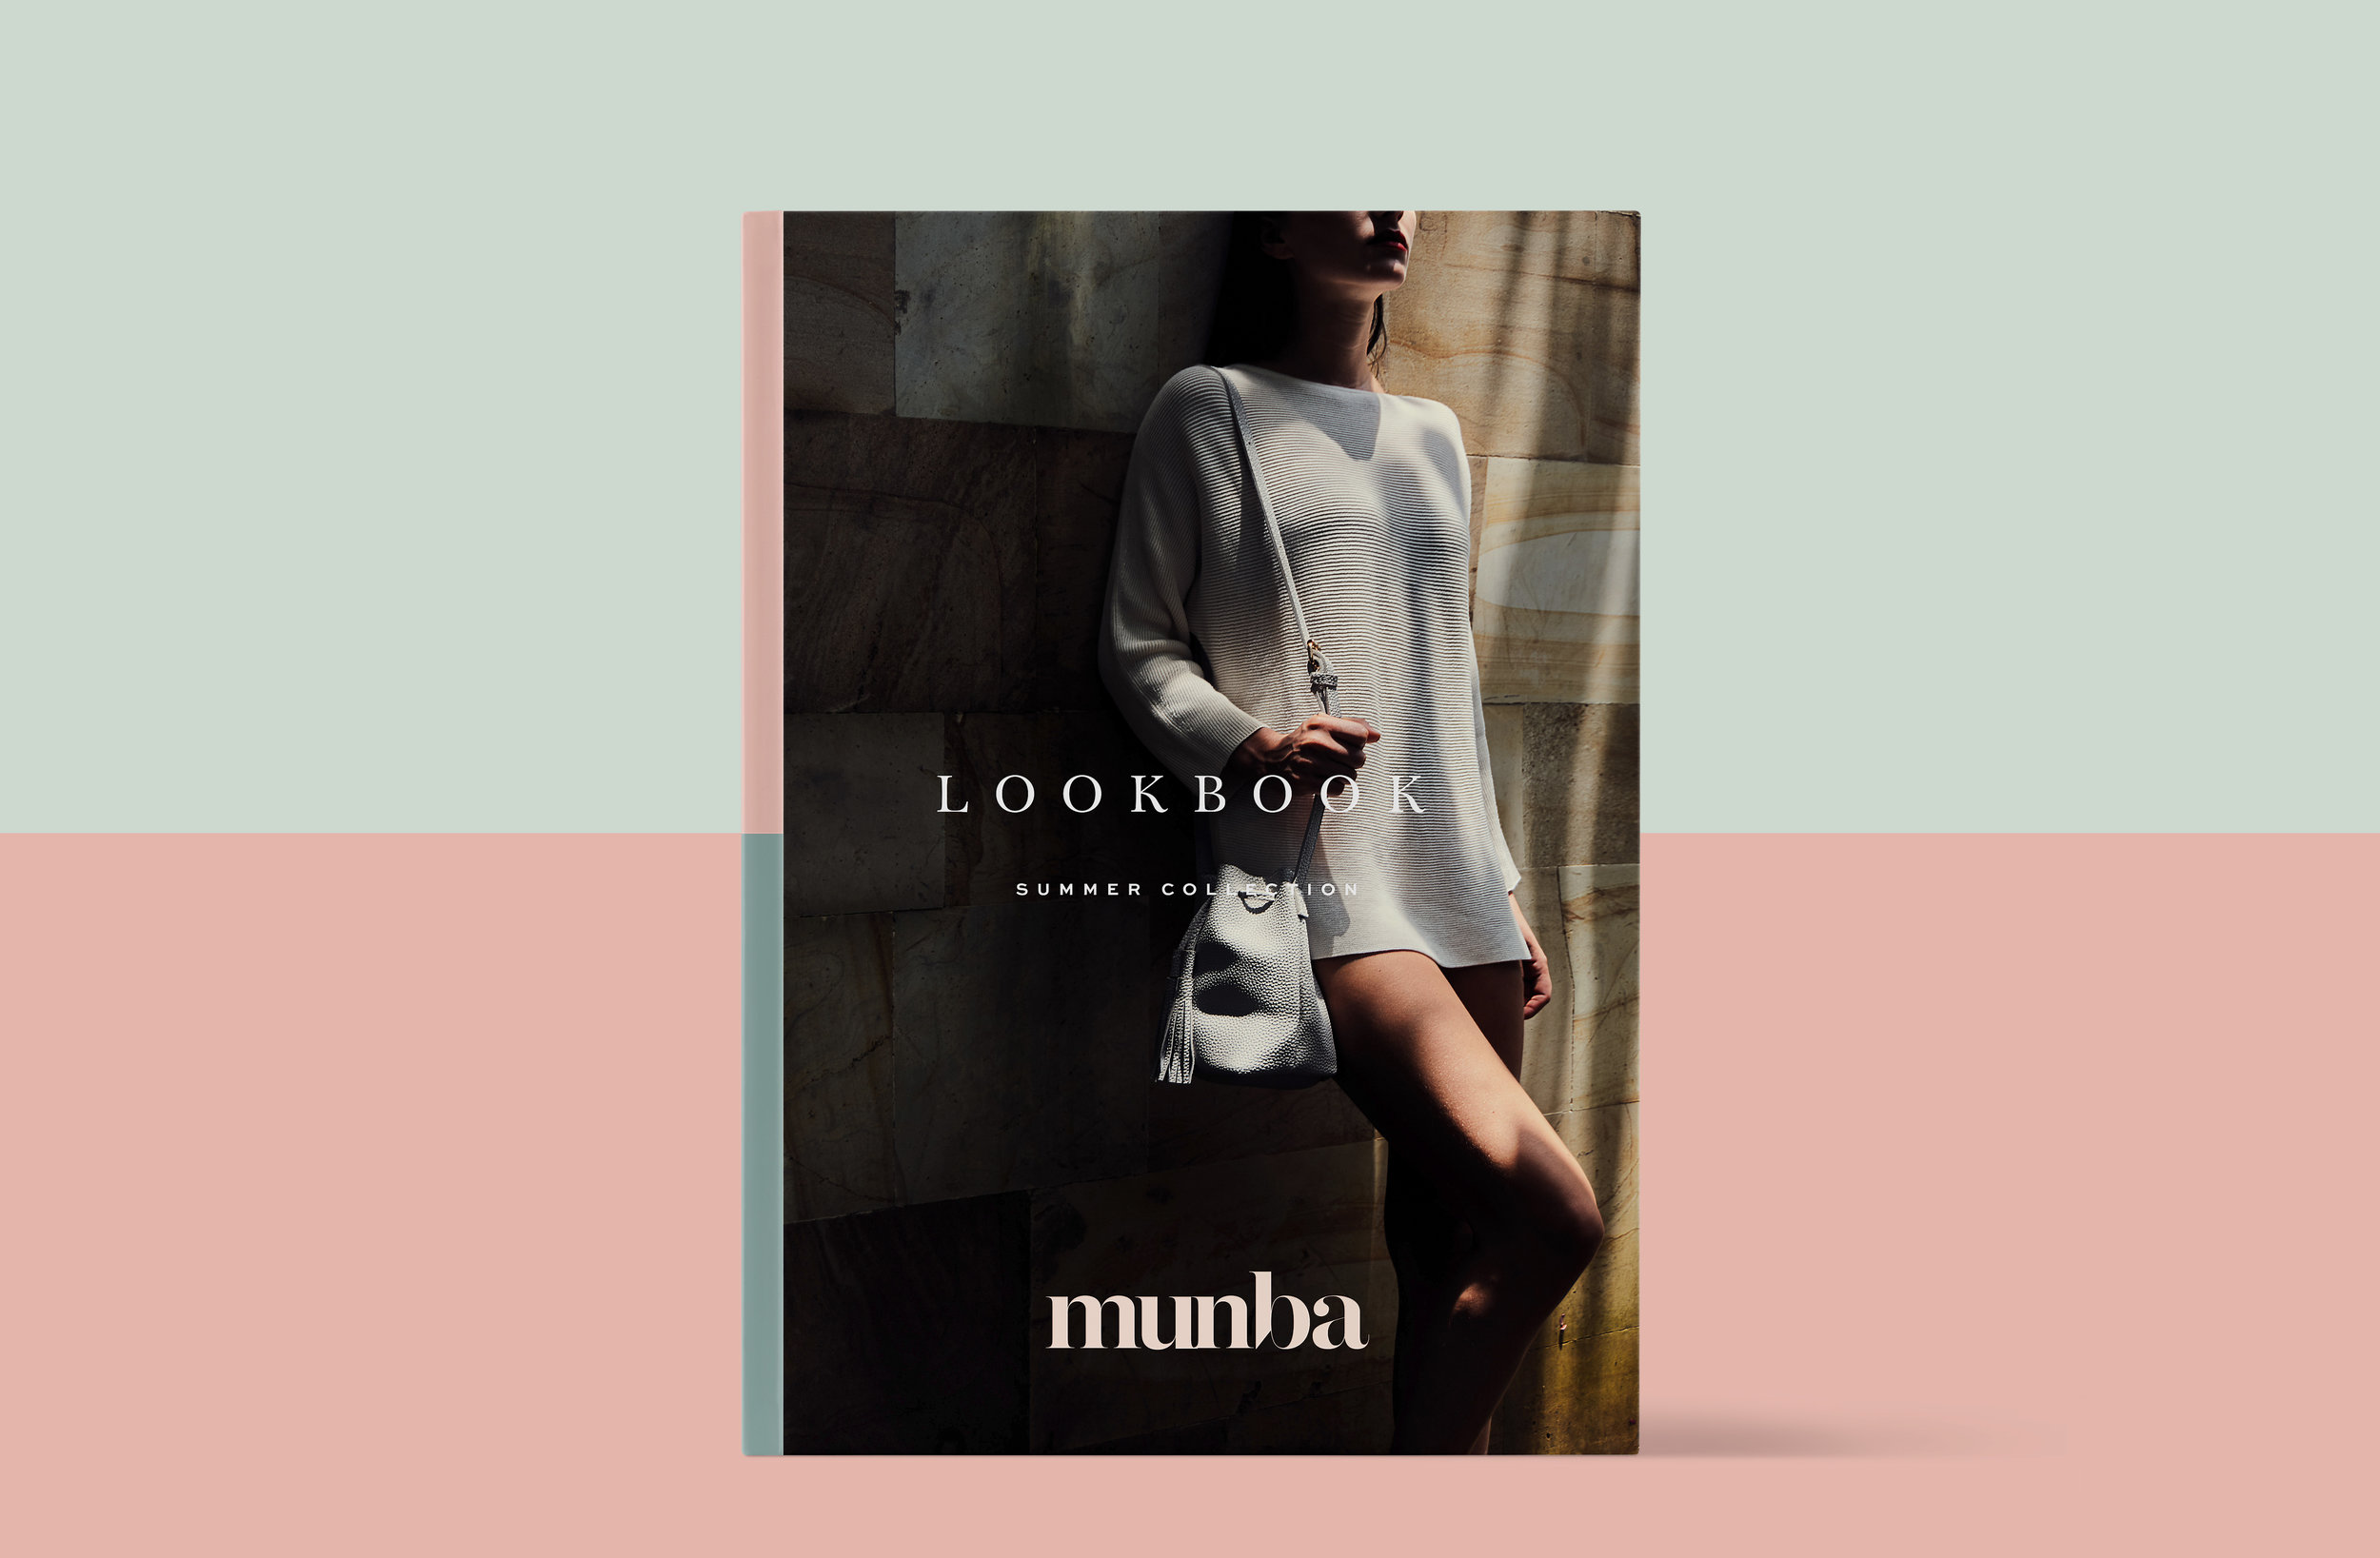 munba-lookbook.jpg